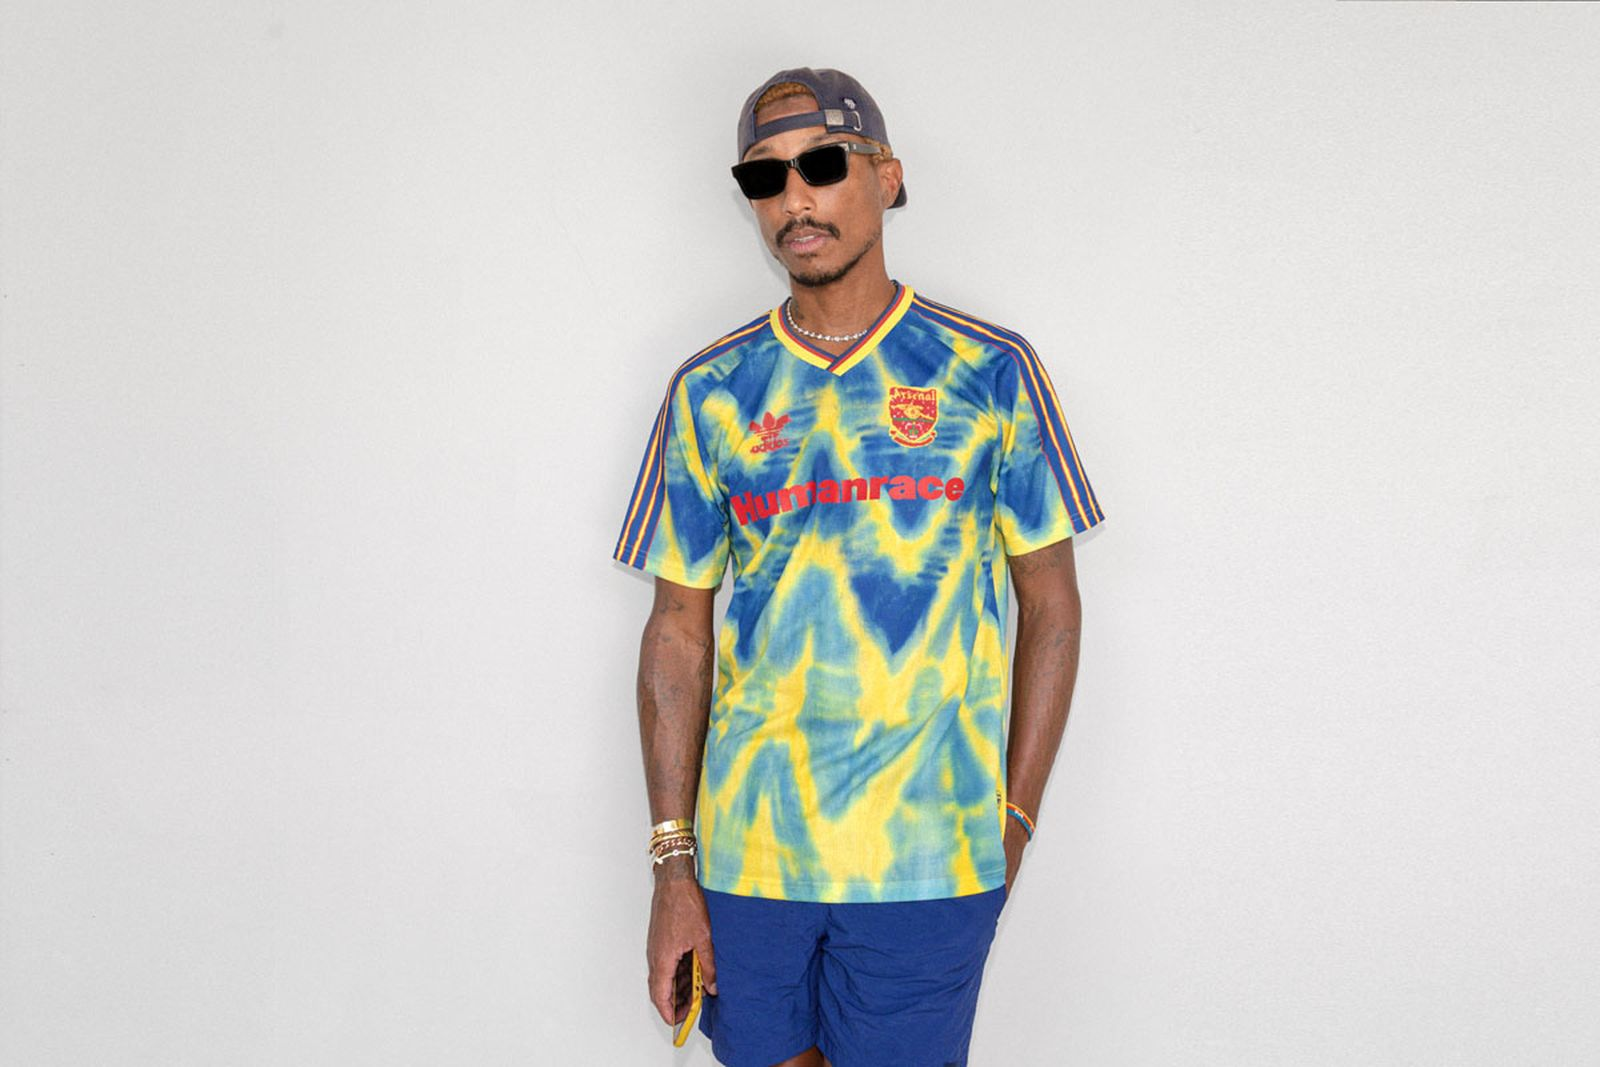 pharrell-williams-adidas-human-race-jerseys-buy-now-05